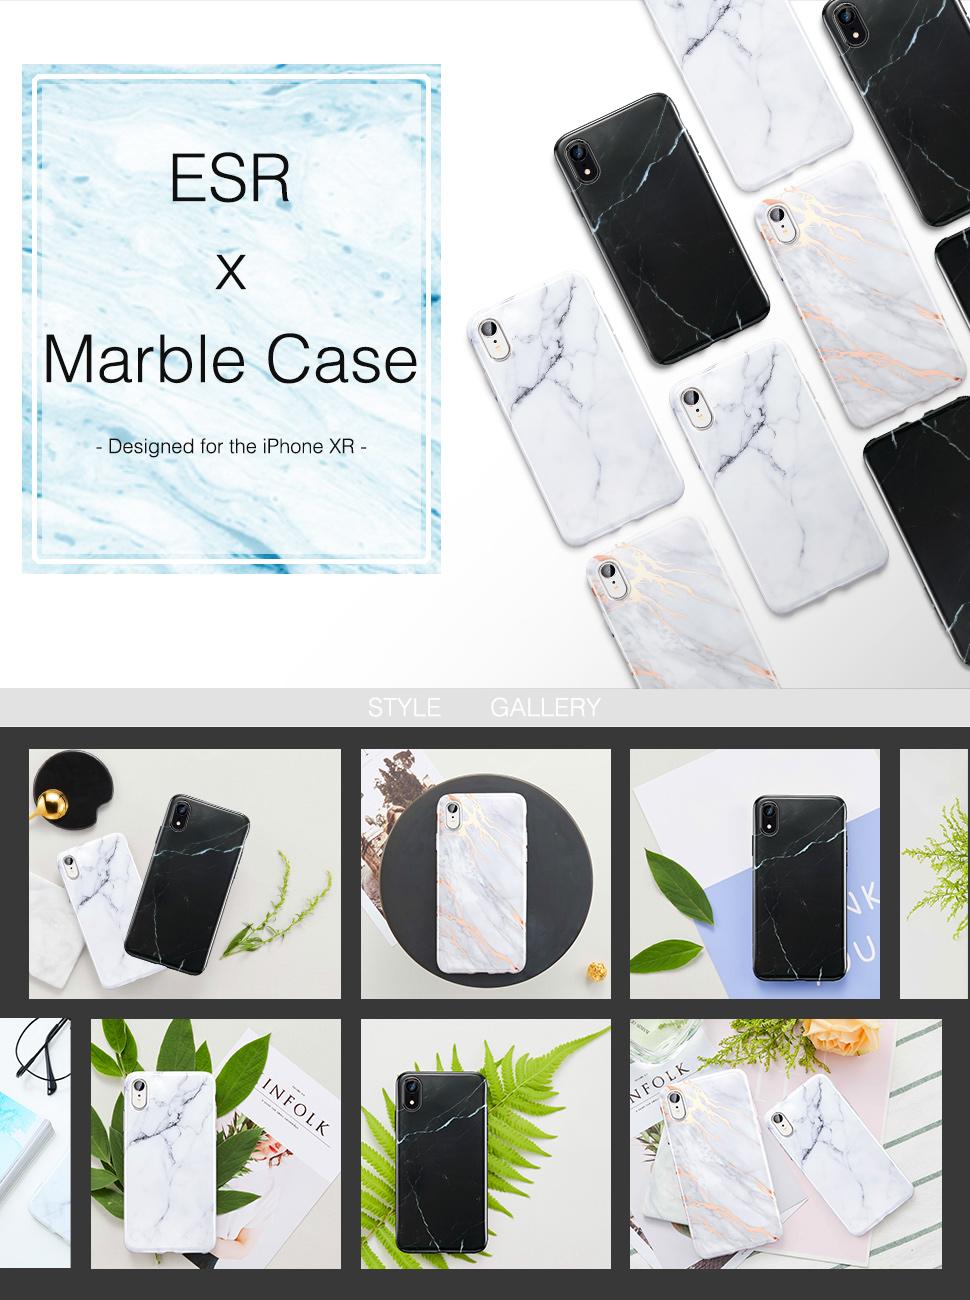 ESR Marble case for iPhone XR, Gohub Shop